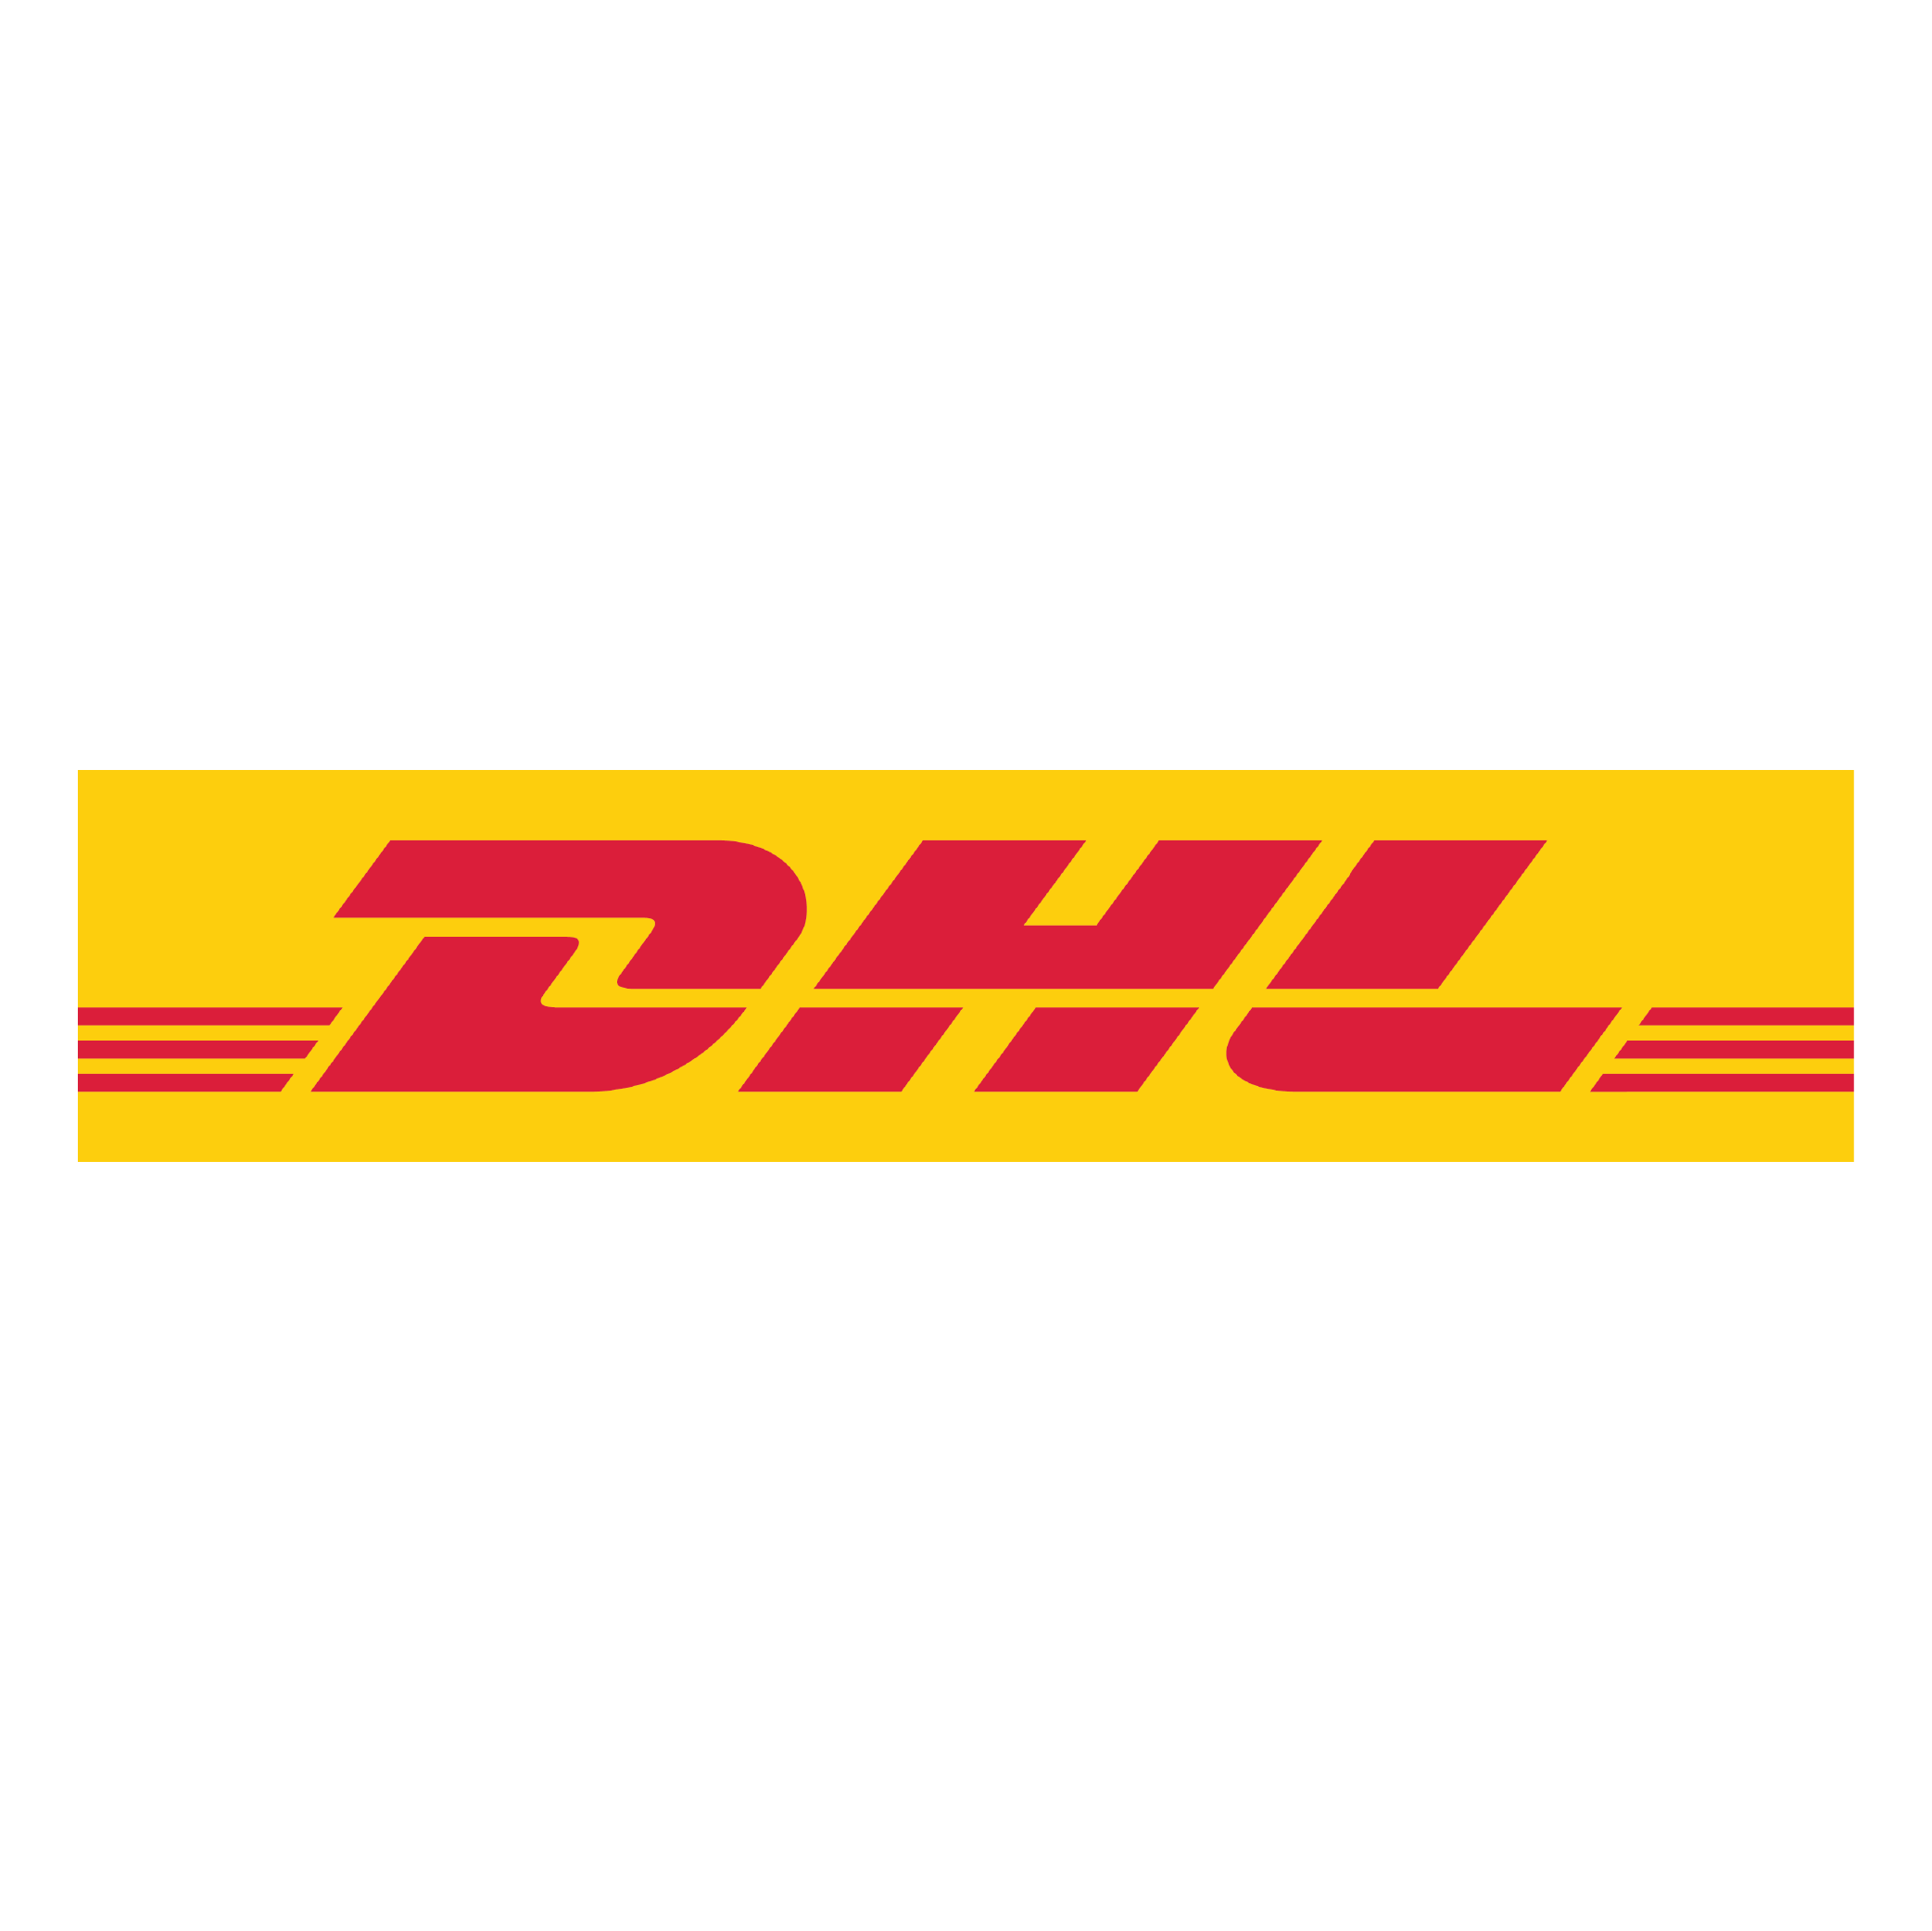 200219_ logo for website_DHL